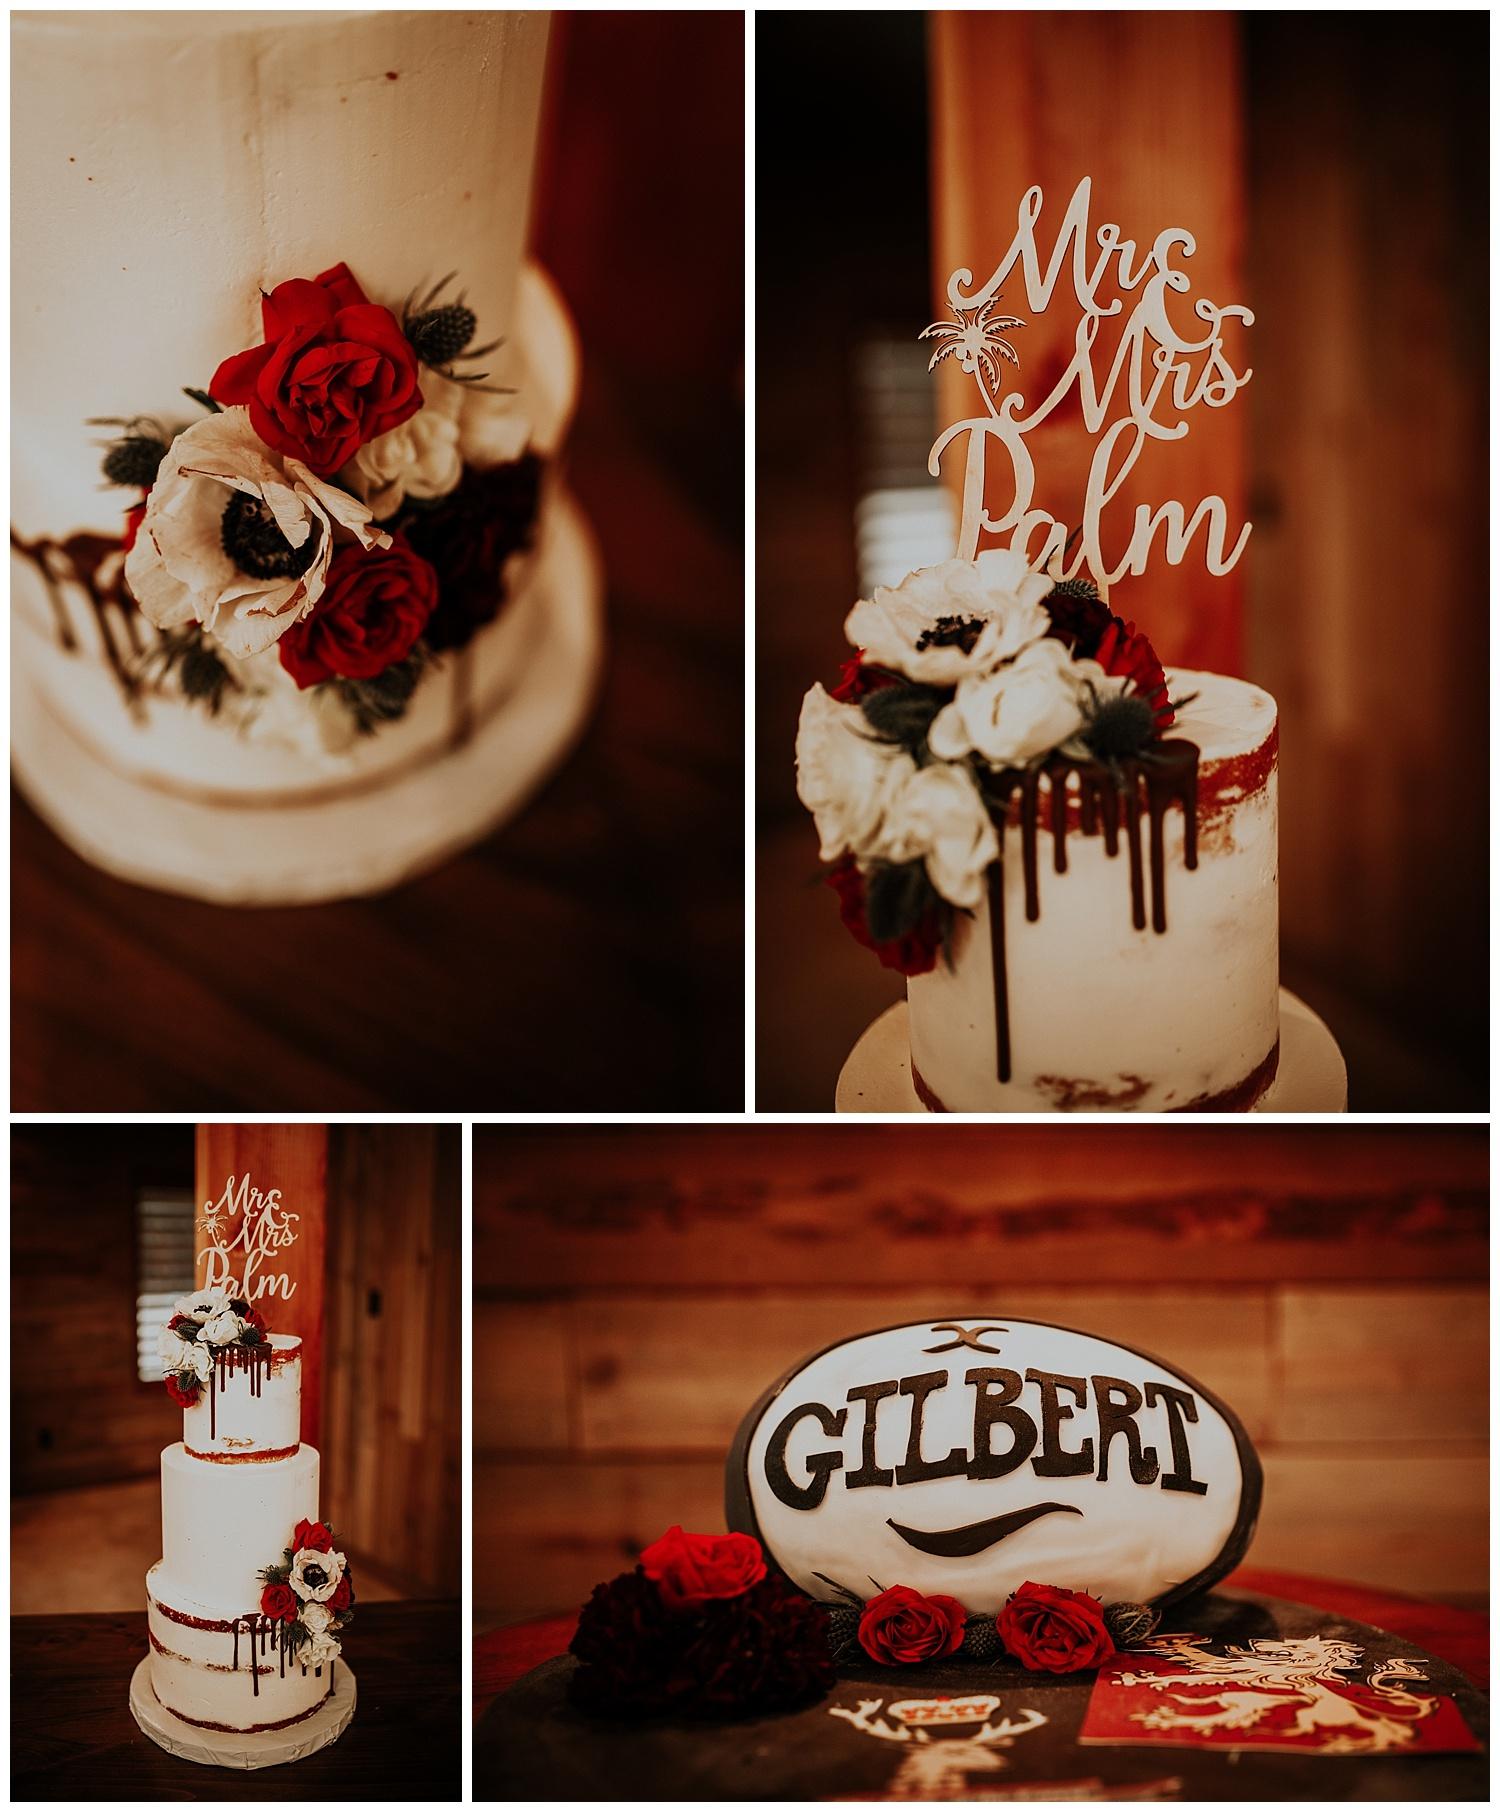 Laken-Mackenzie-Photography-Palm-Whispering-Oaks-Wedding-Venue-Dallas-Wedding-Photographer07.jpg